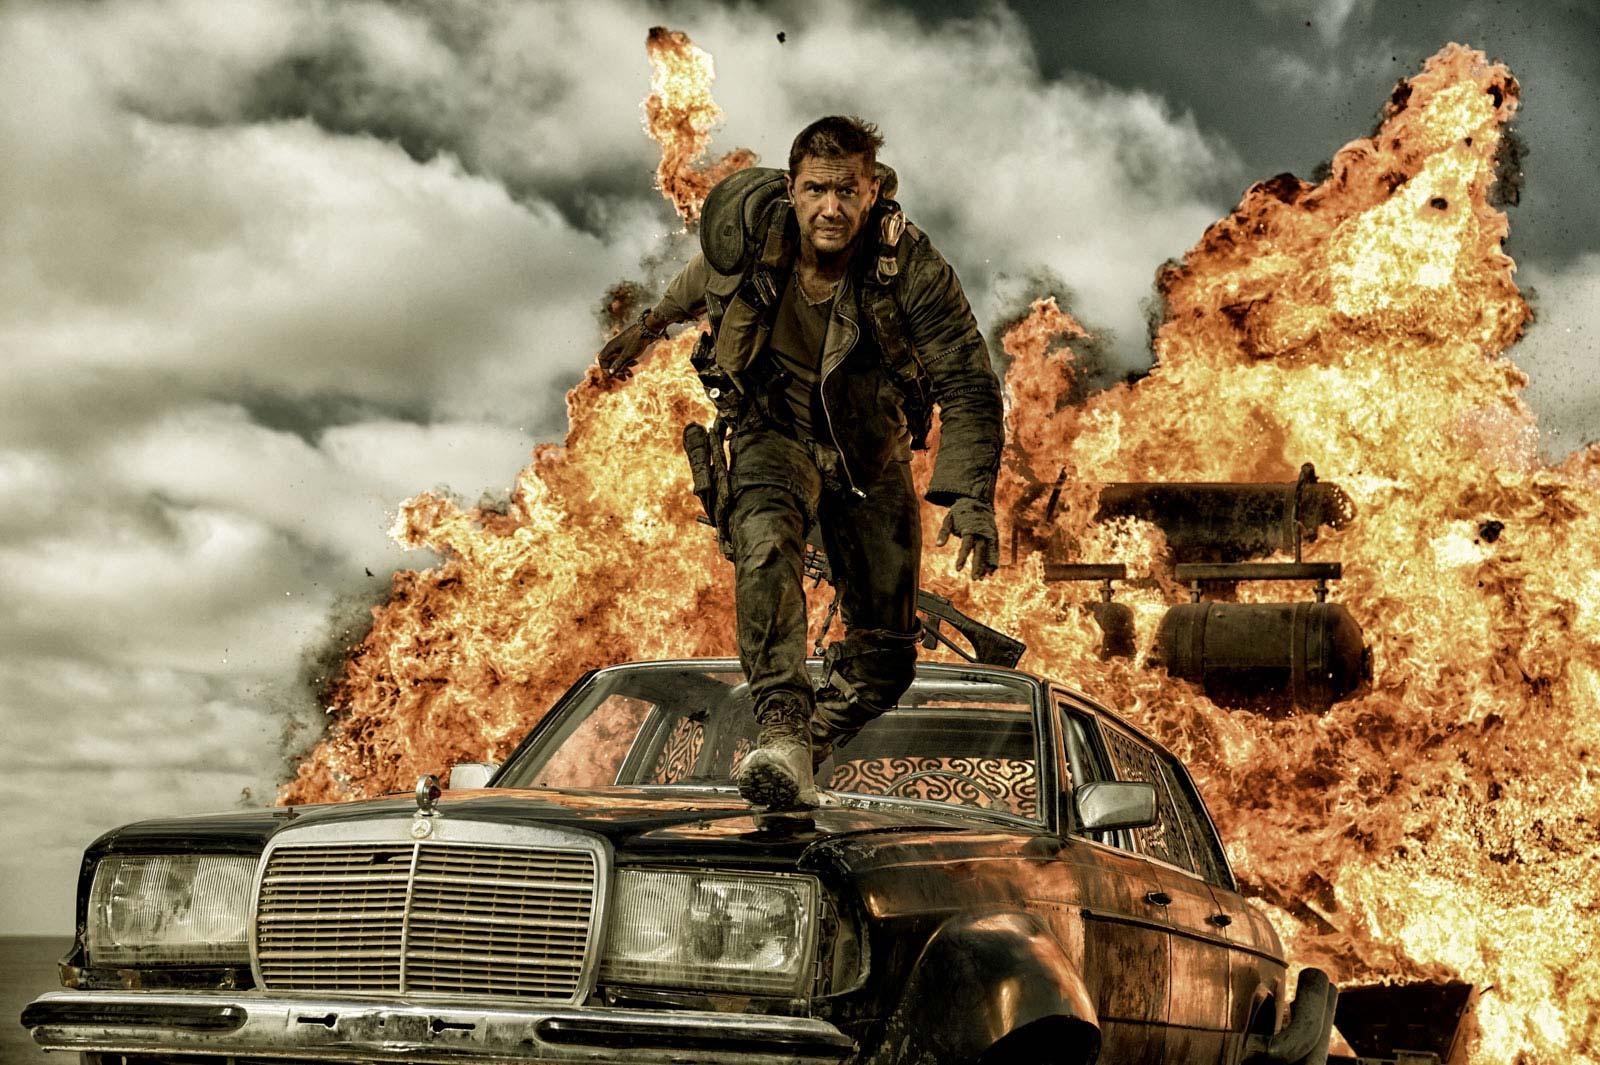 Tom Hardy ging zwar leer aus - 'Mad Max: Fury Road' triumphierte aber trotzdem bei den Oscars